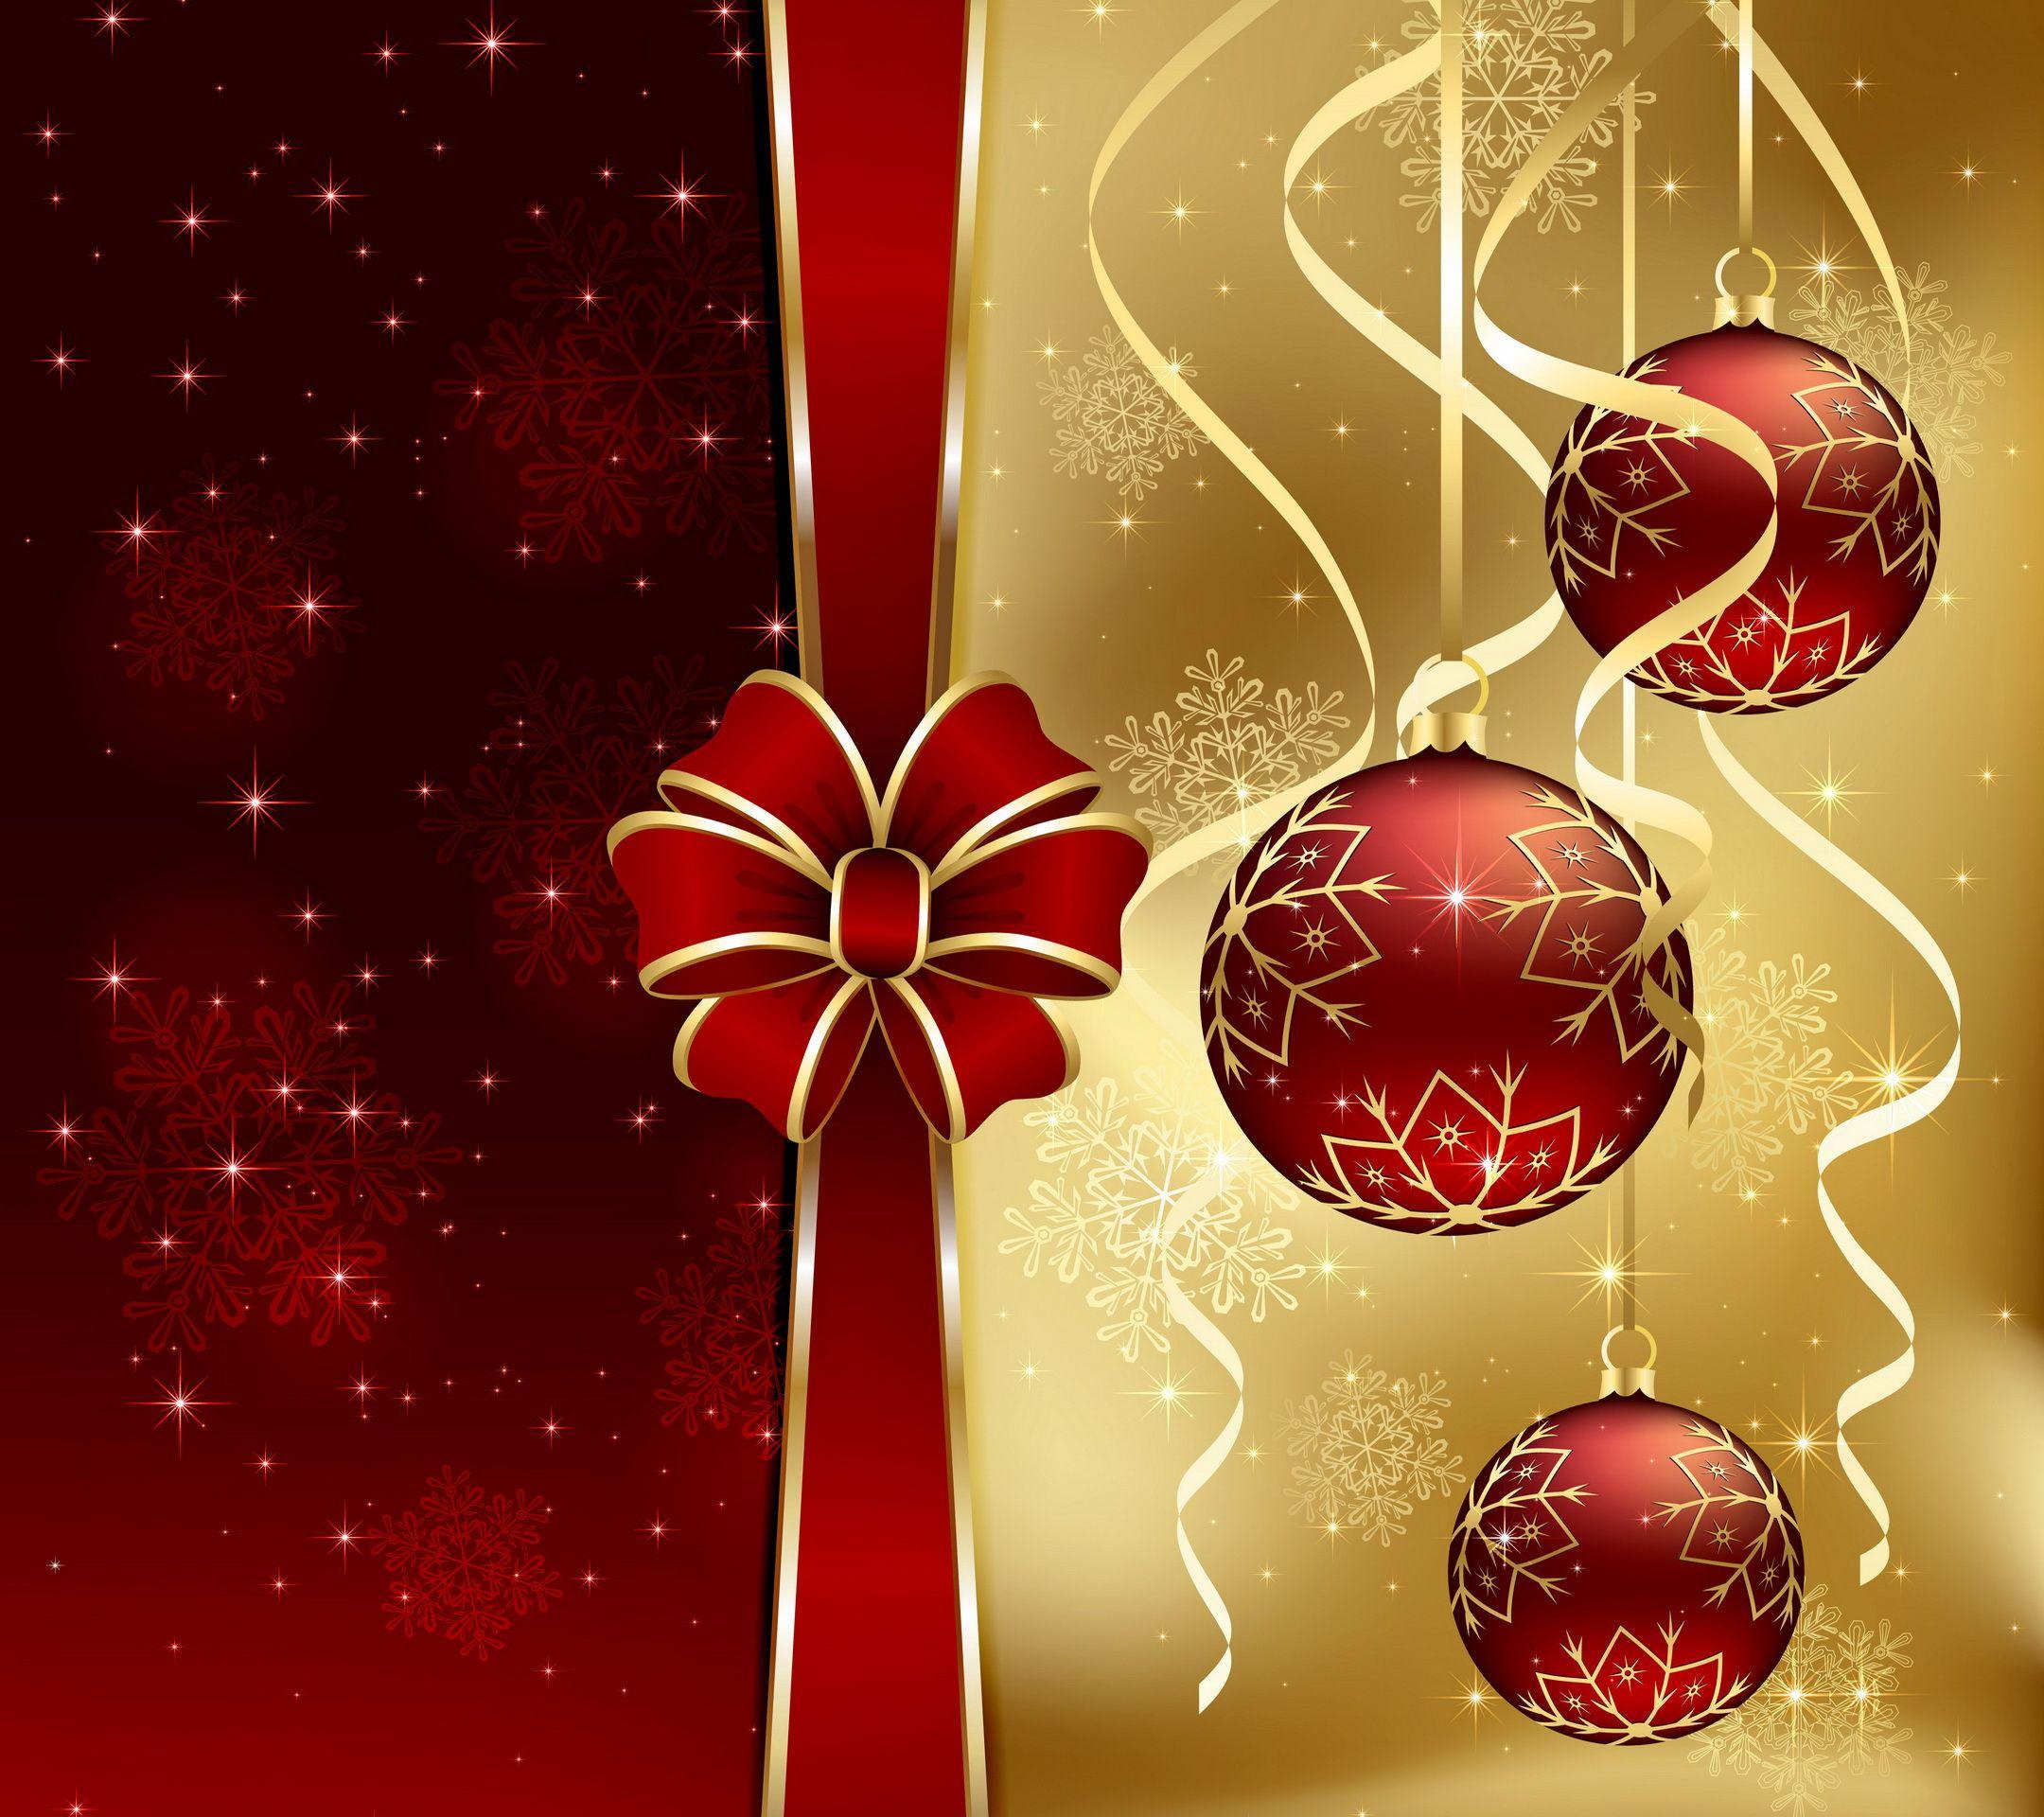 Pin by Faye Salmon on Christmas & New Year Pinterest